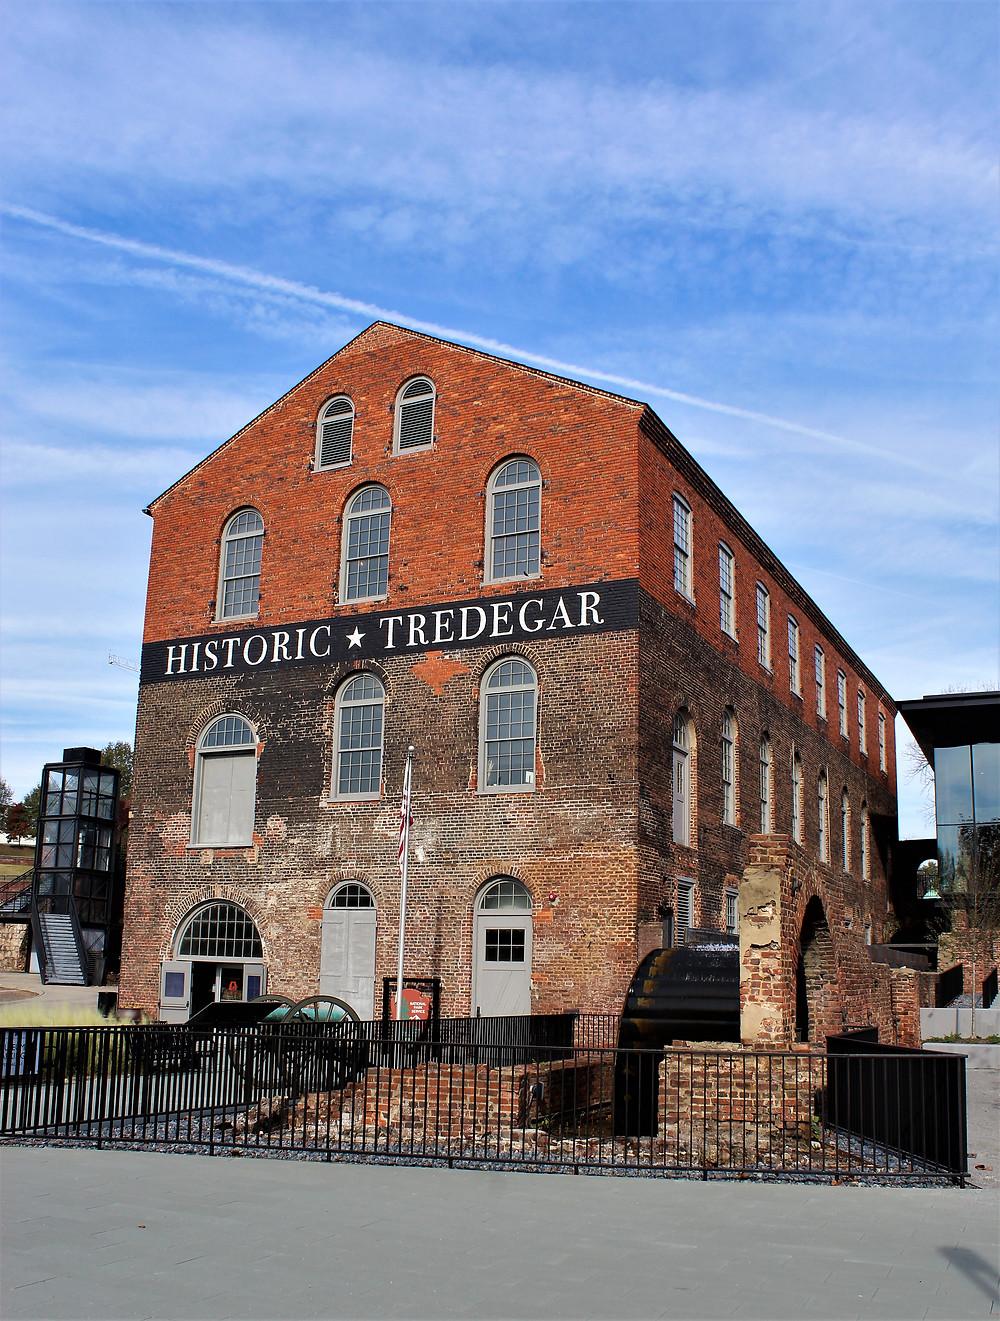 The Historic Tredegar Pattern Building